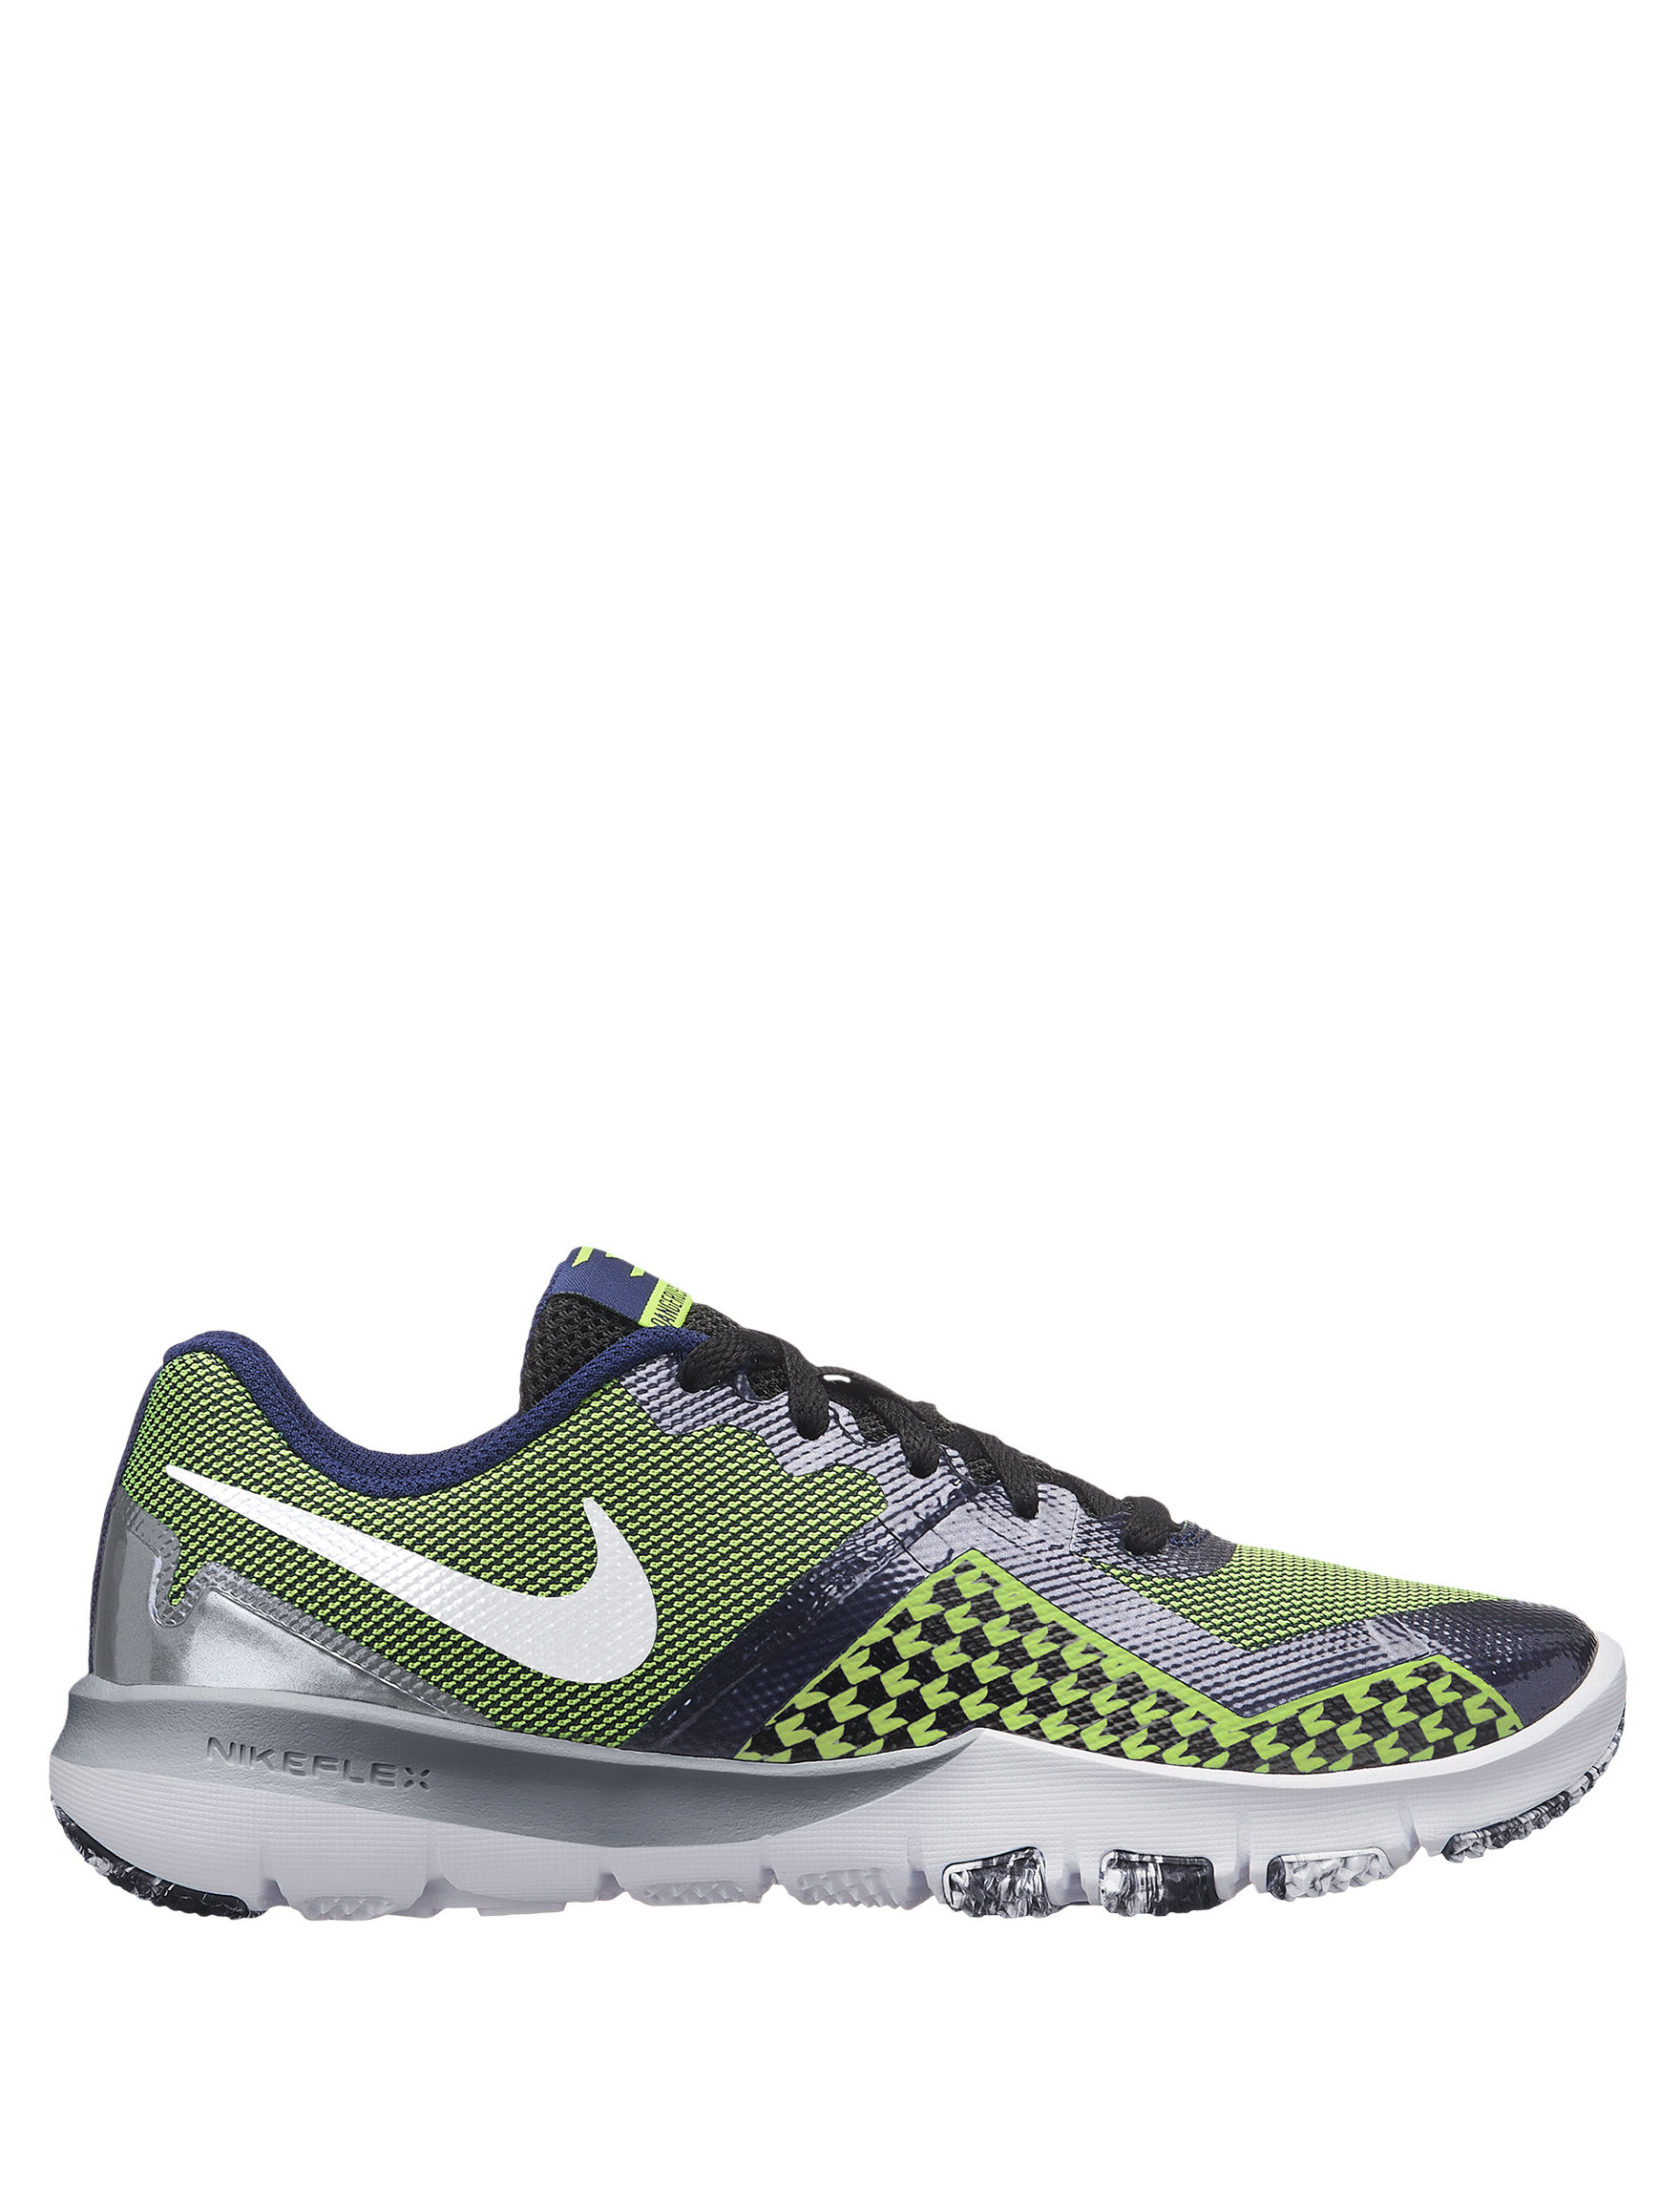 d7efb090e4156 Nike Flex Control II RW Training Shoes - Boys 4-7